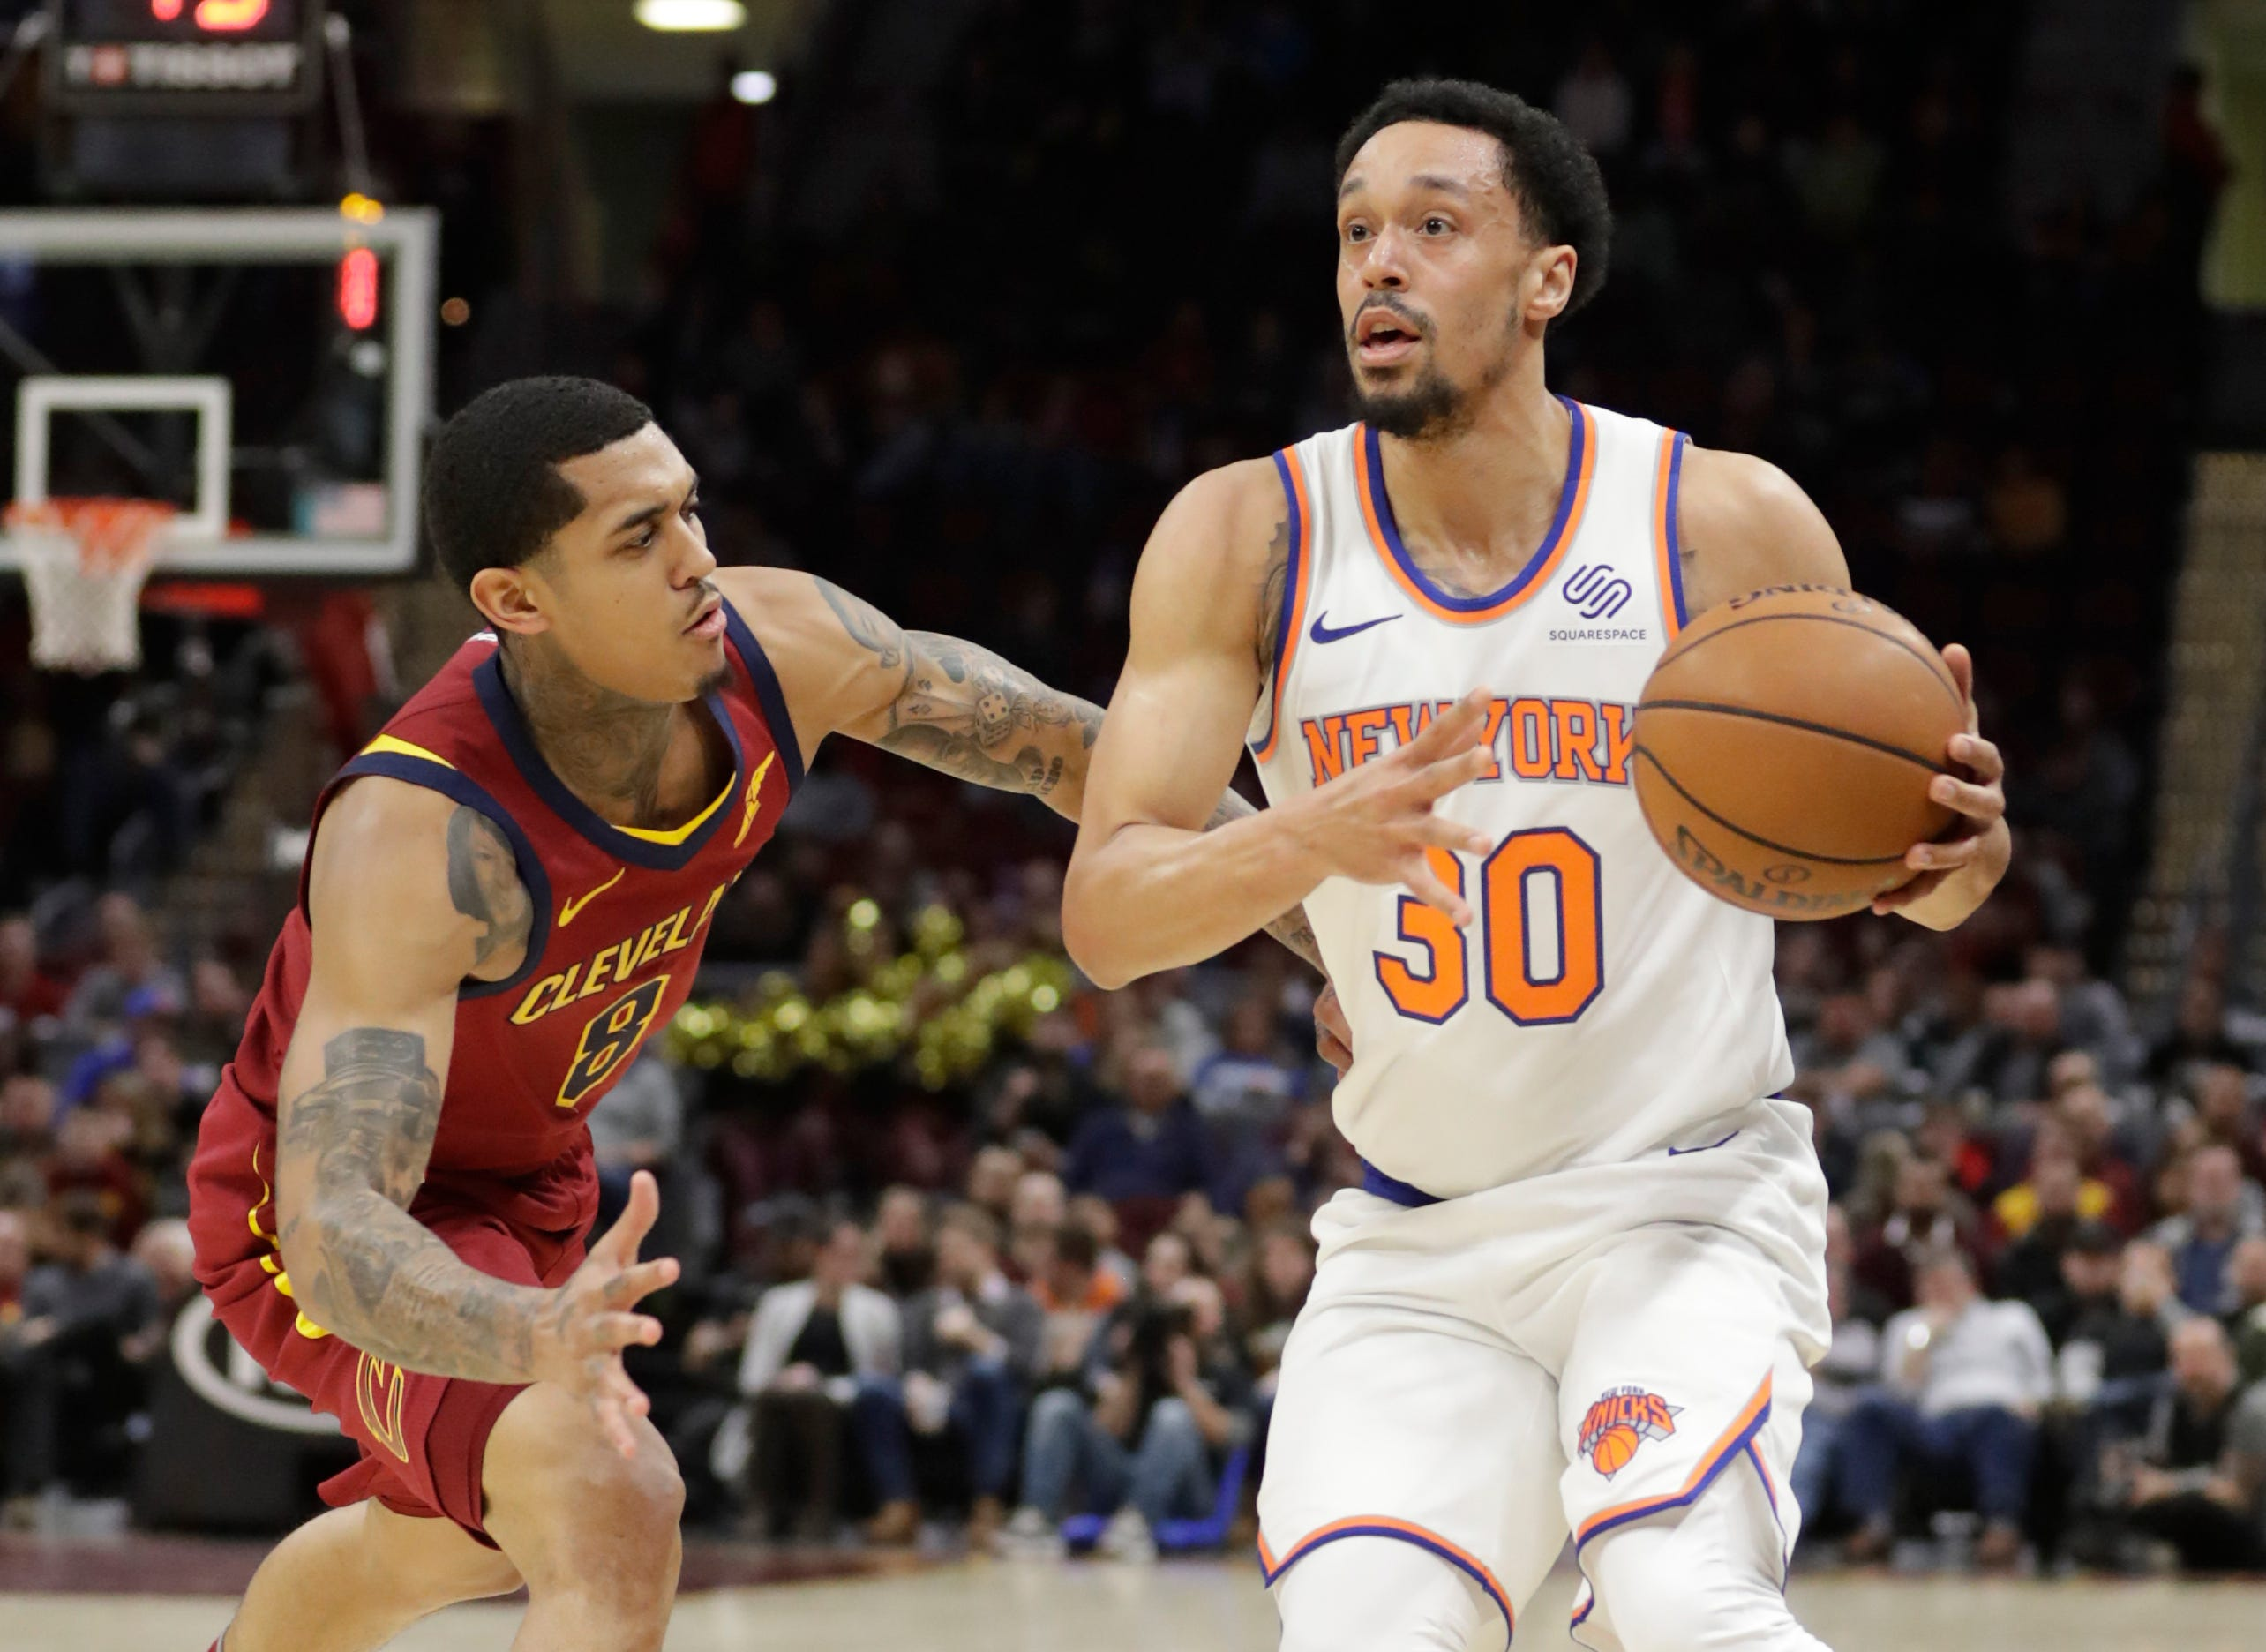 Former Star Jenkins Basketball New Vanderbilt York John Knicks Sign SqUzpMV